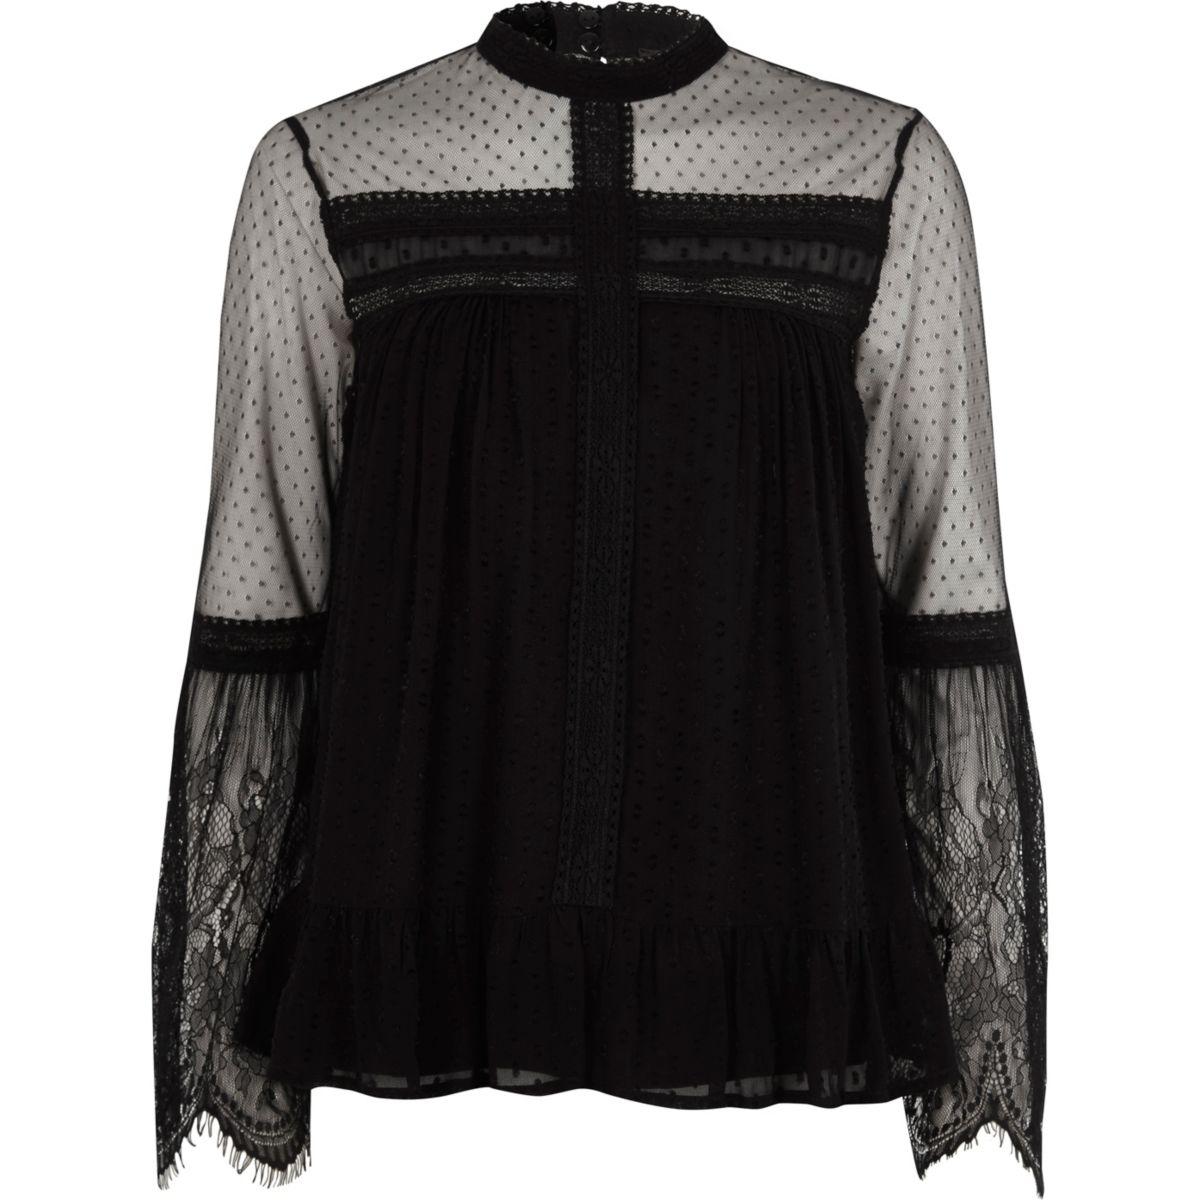 Black dobby mesh lace trim high neck top